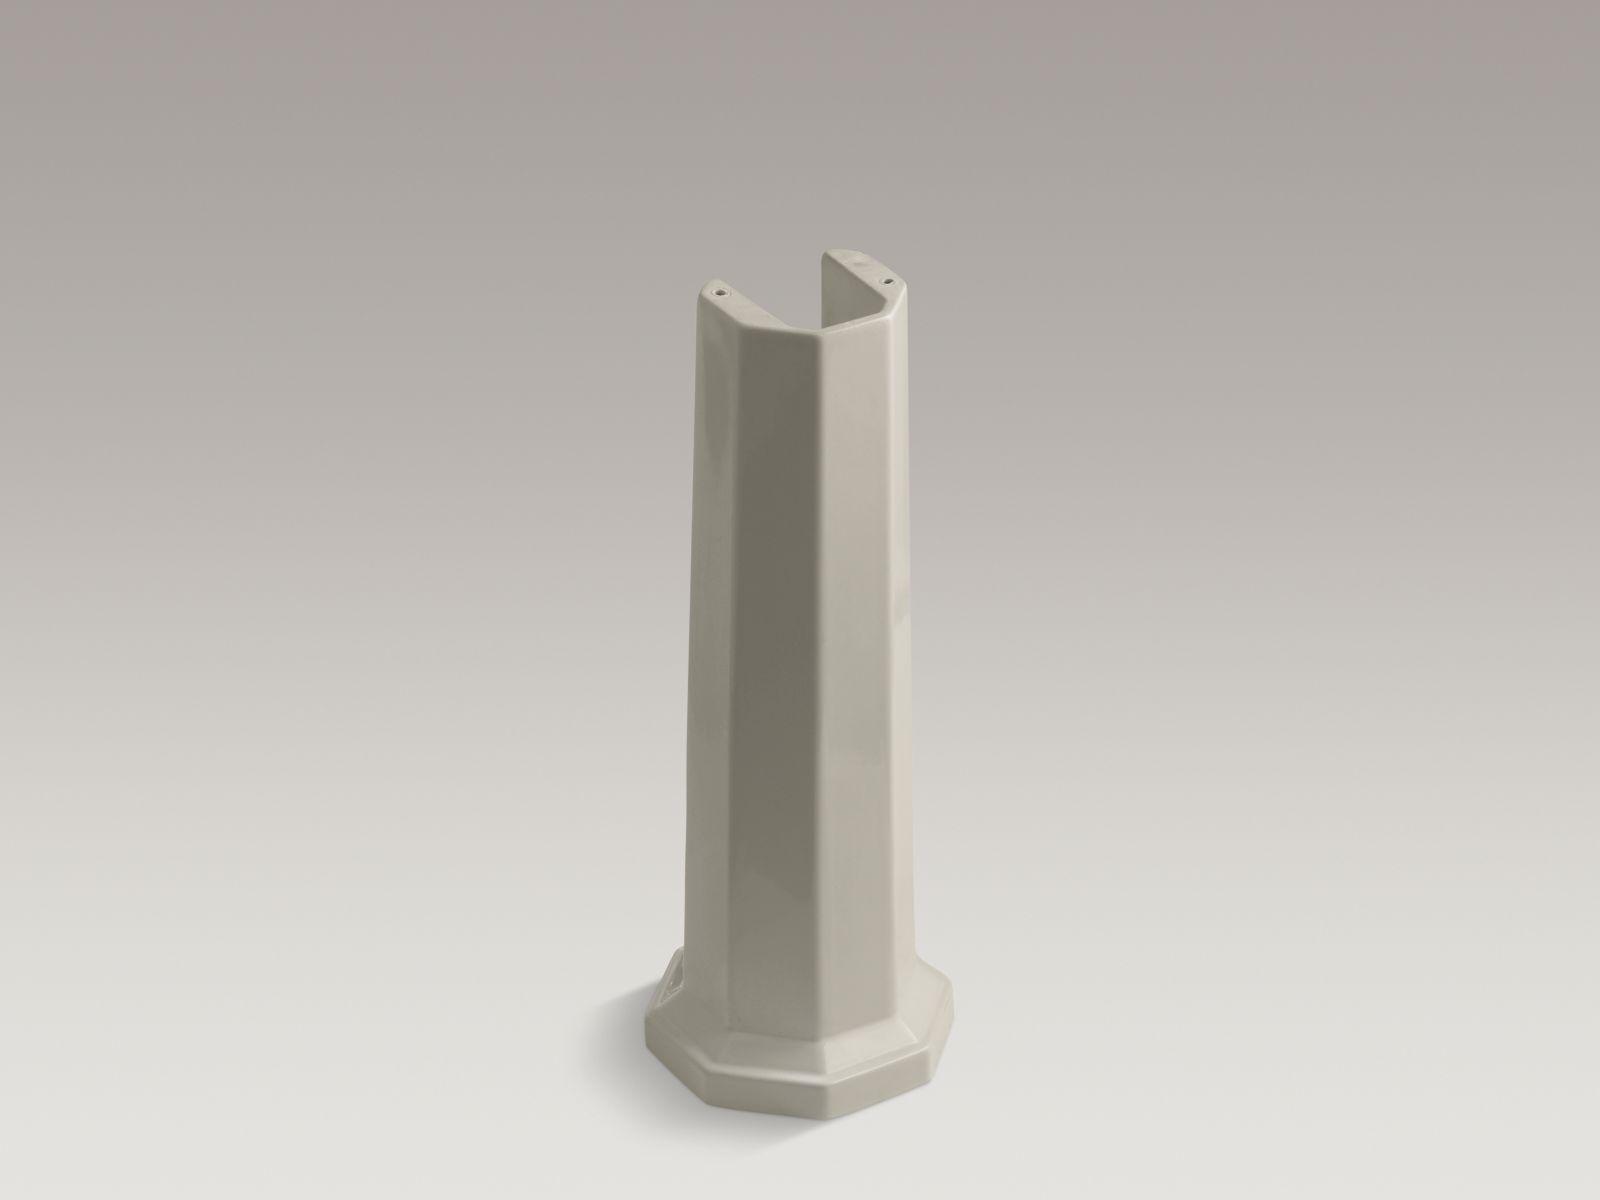 Kohler K-2324-G9 Kathryn Lavatory Pedestal Sandbar